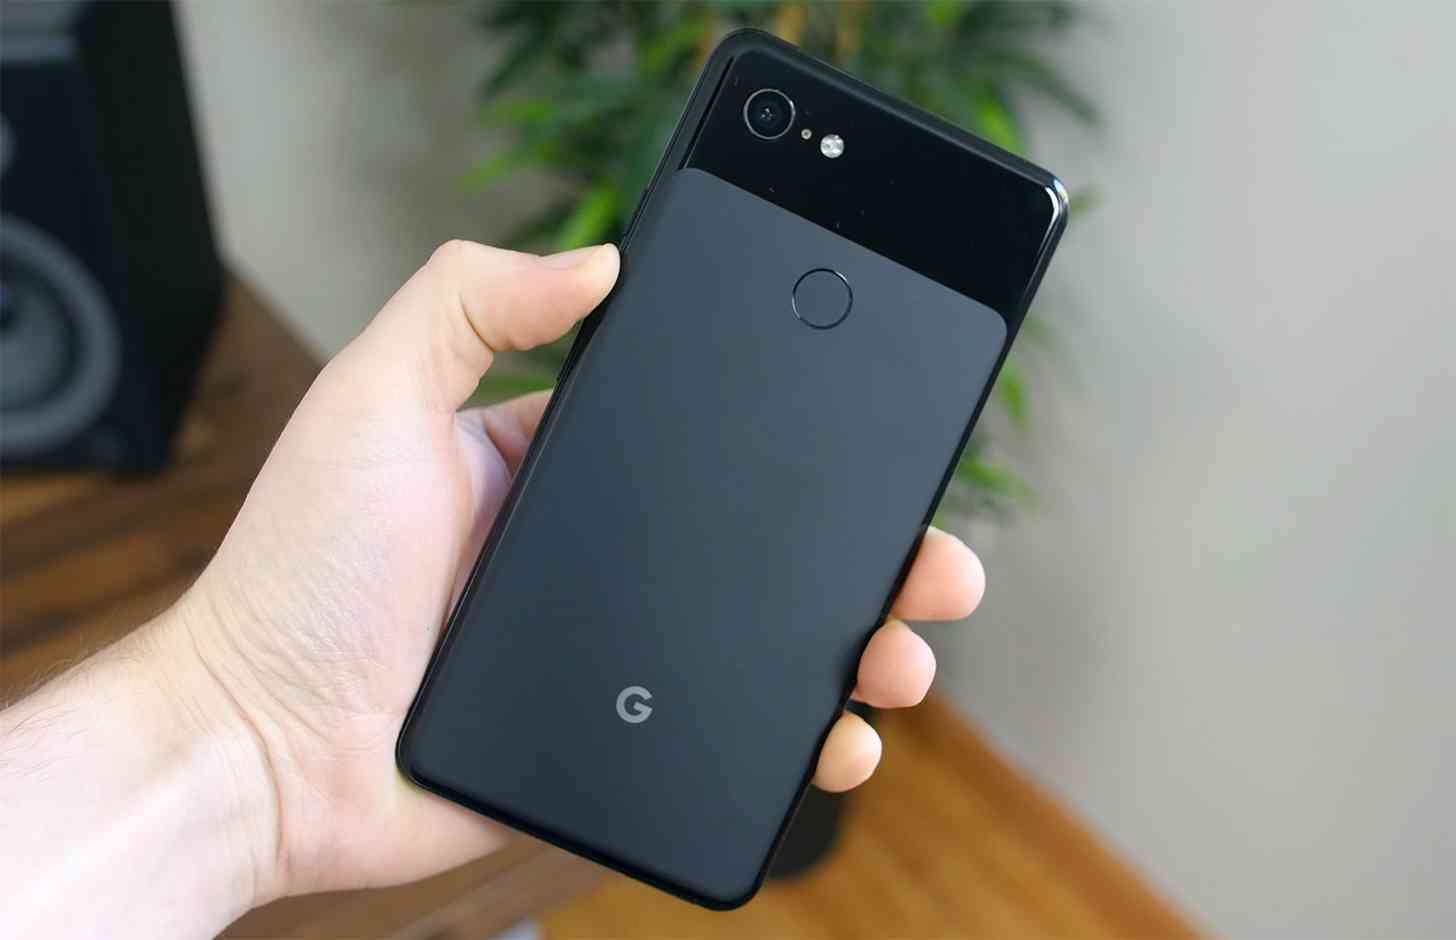 Google Pixel 3 XL camera hands-on